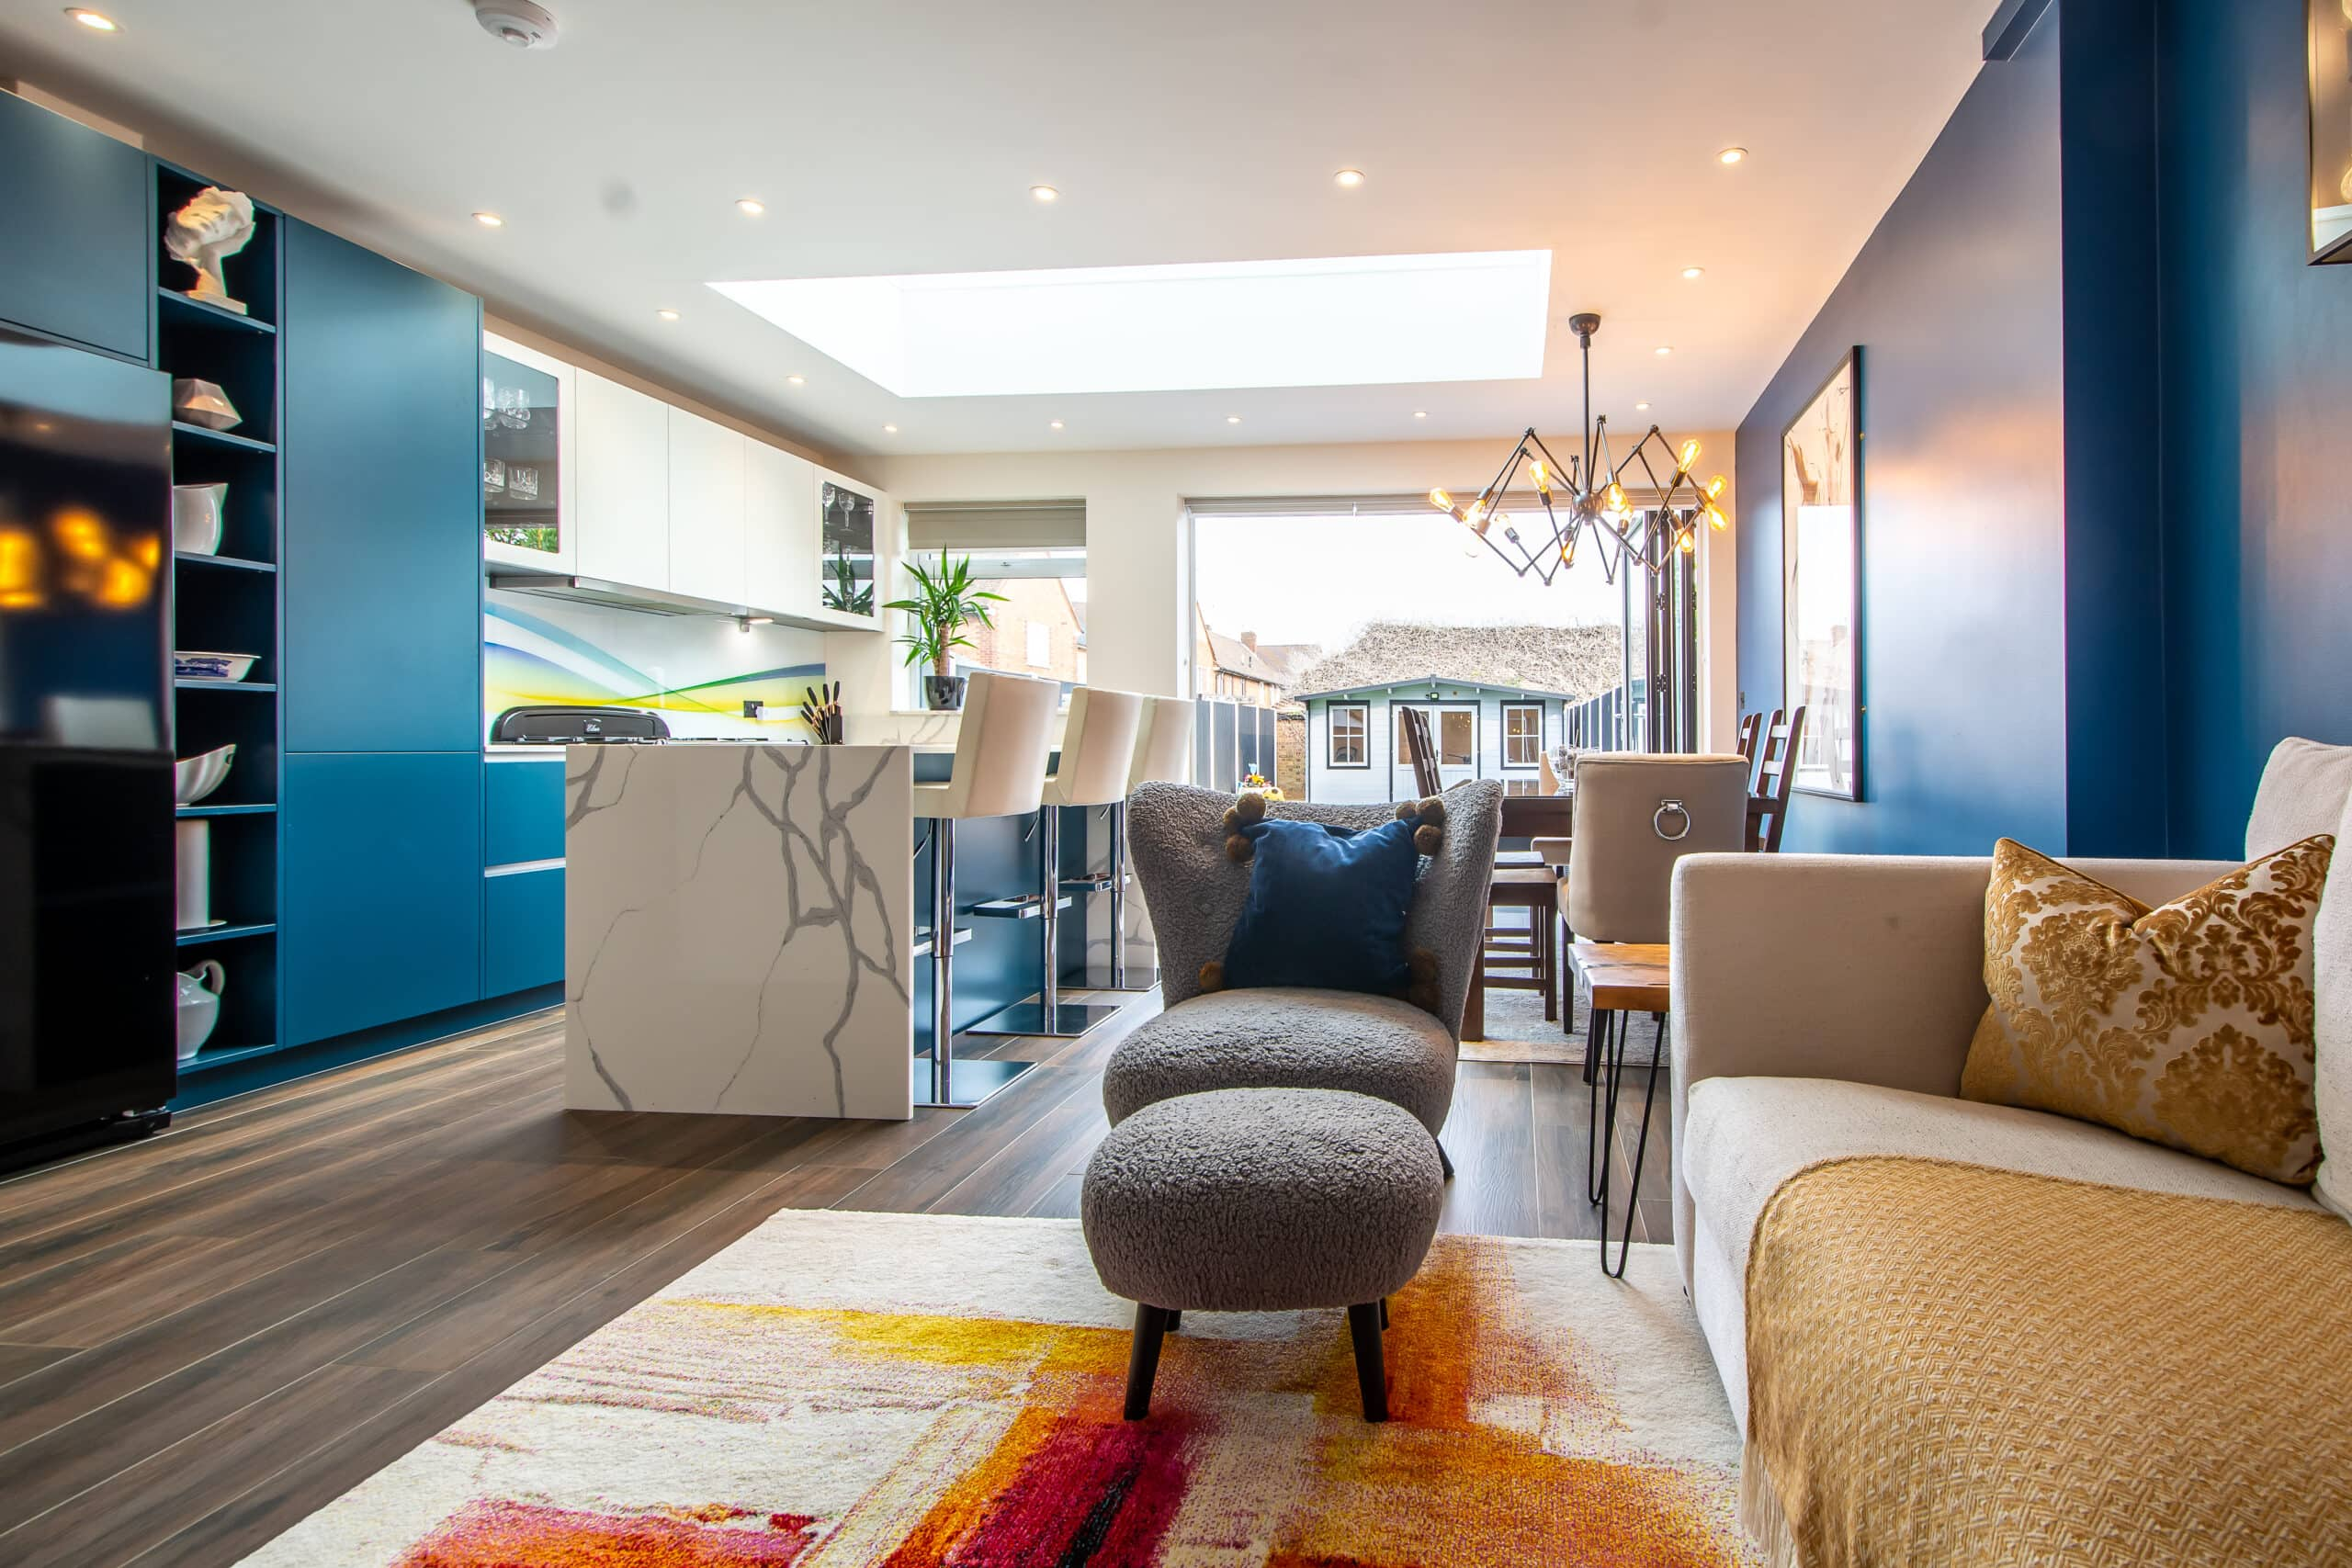 Smart new kitchen with cream units and granite worktops